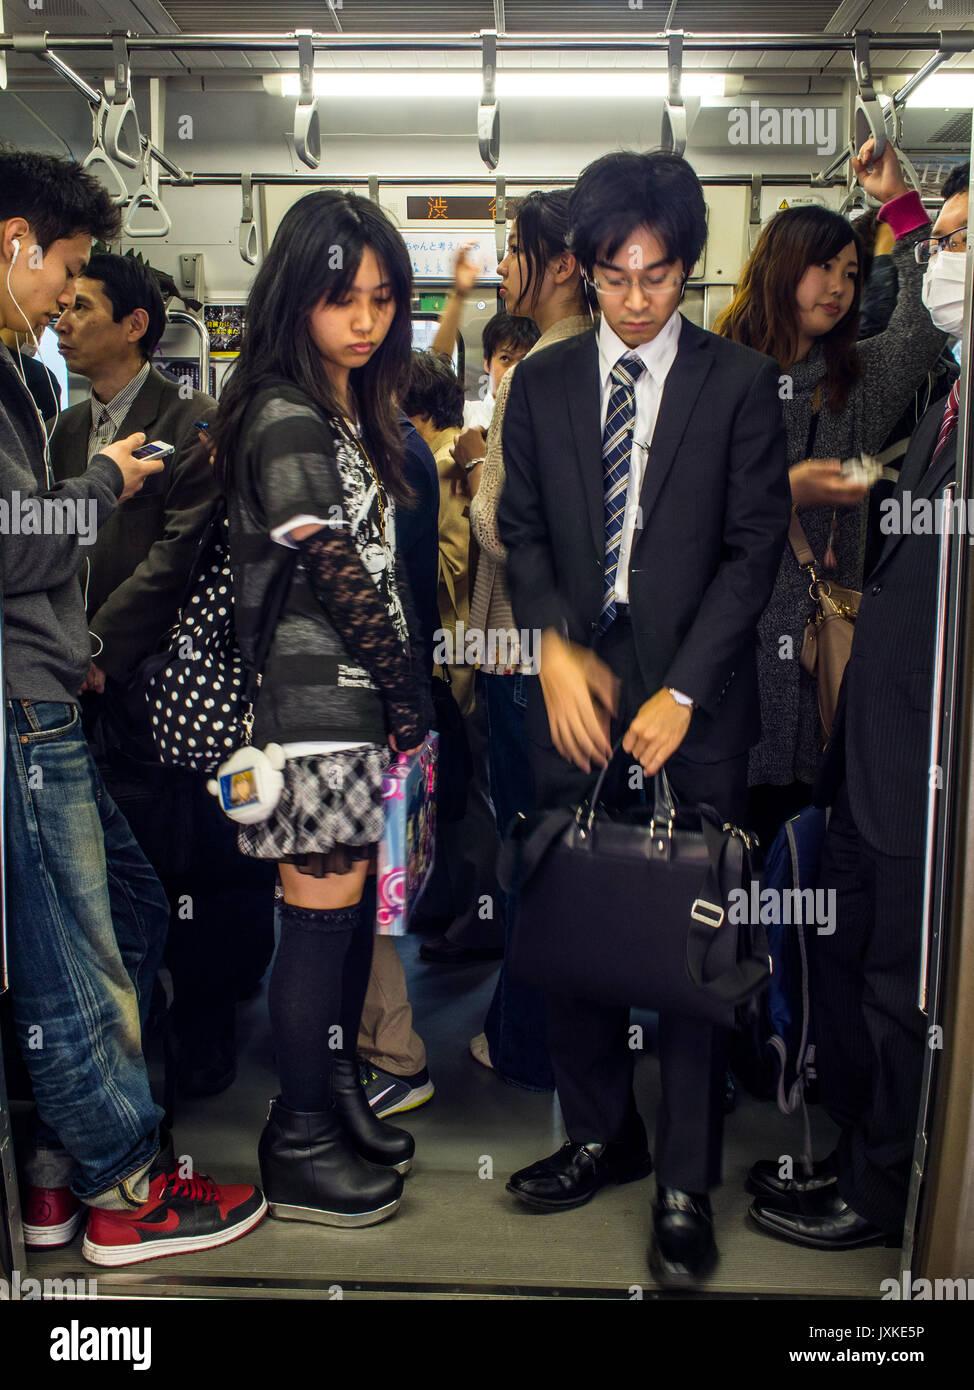 Crowded commuter train, Shinjuku Station, Toko, Japan - Stock Image